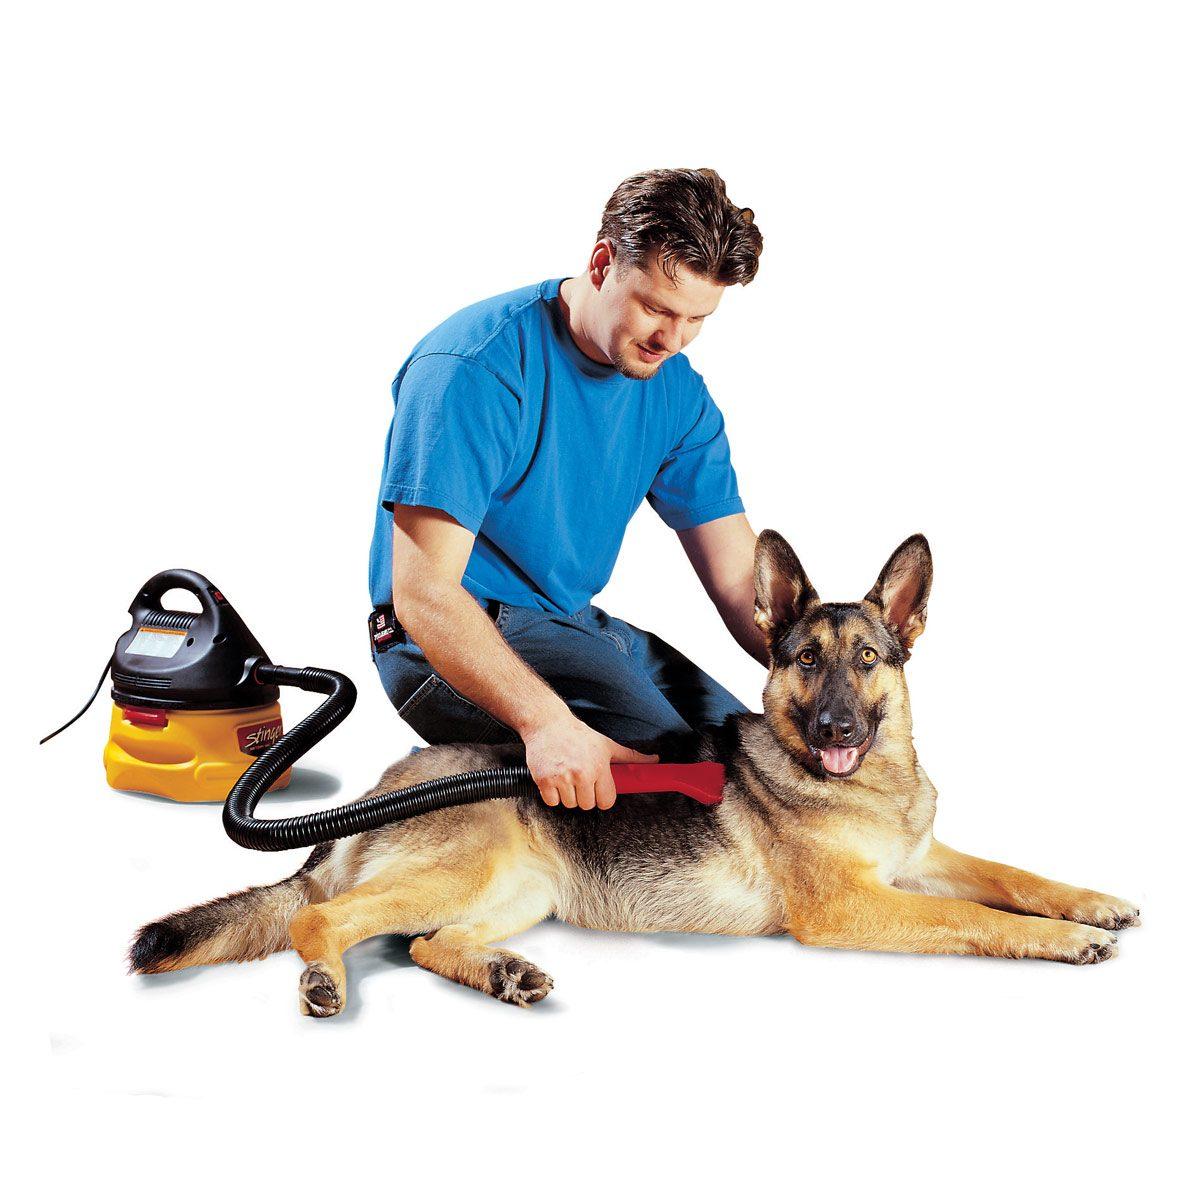 Don T Brush The Dog Use A Vacuum Instead Family Handyman